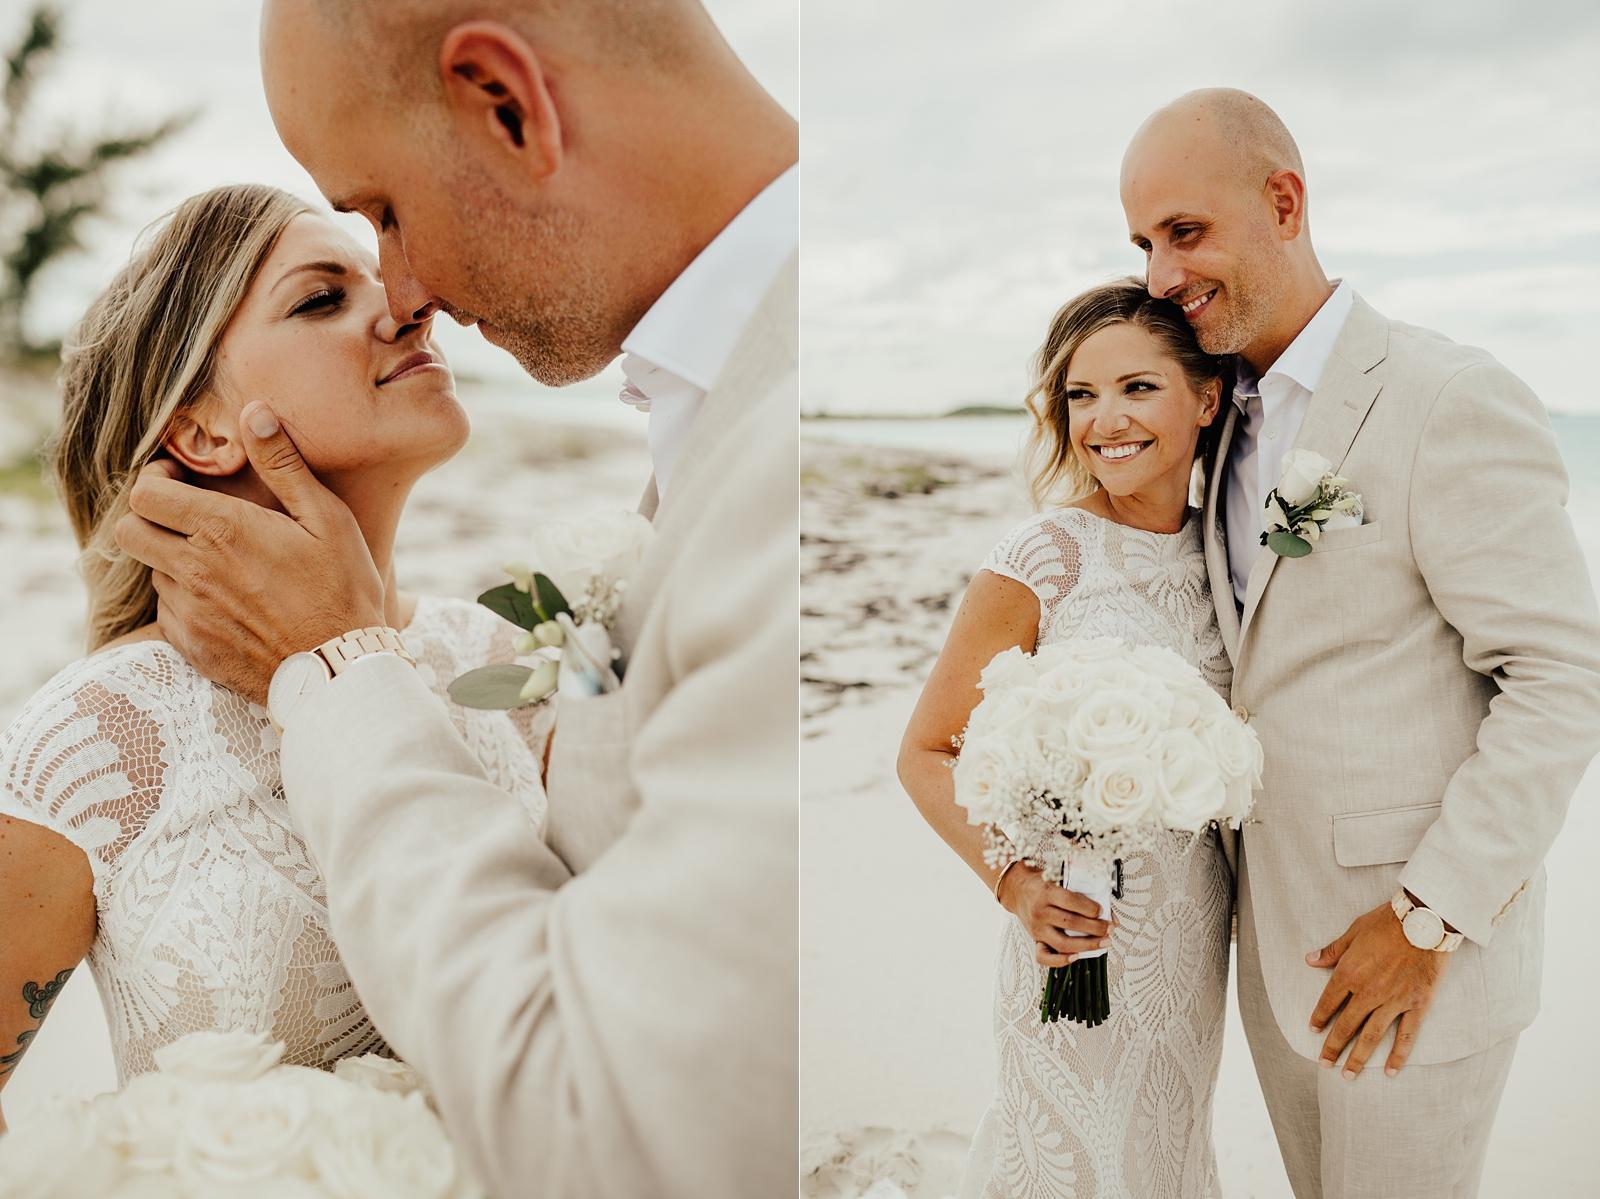 Jenni & Andrew Intimate Beach Destination Wedding in Little Exuma, Bahamas_0487.jpg